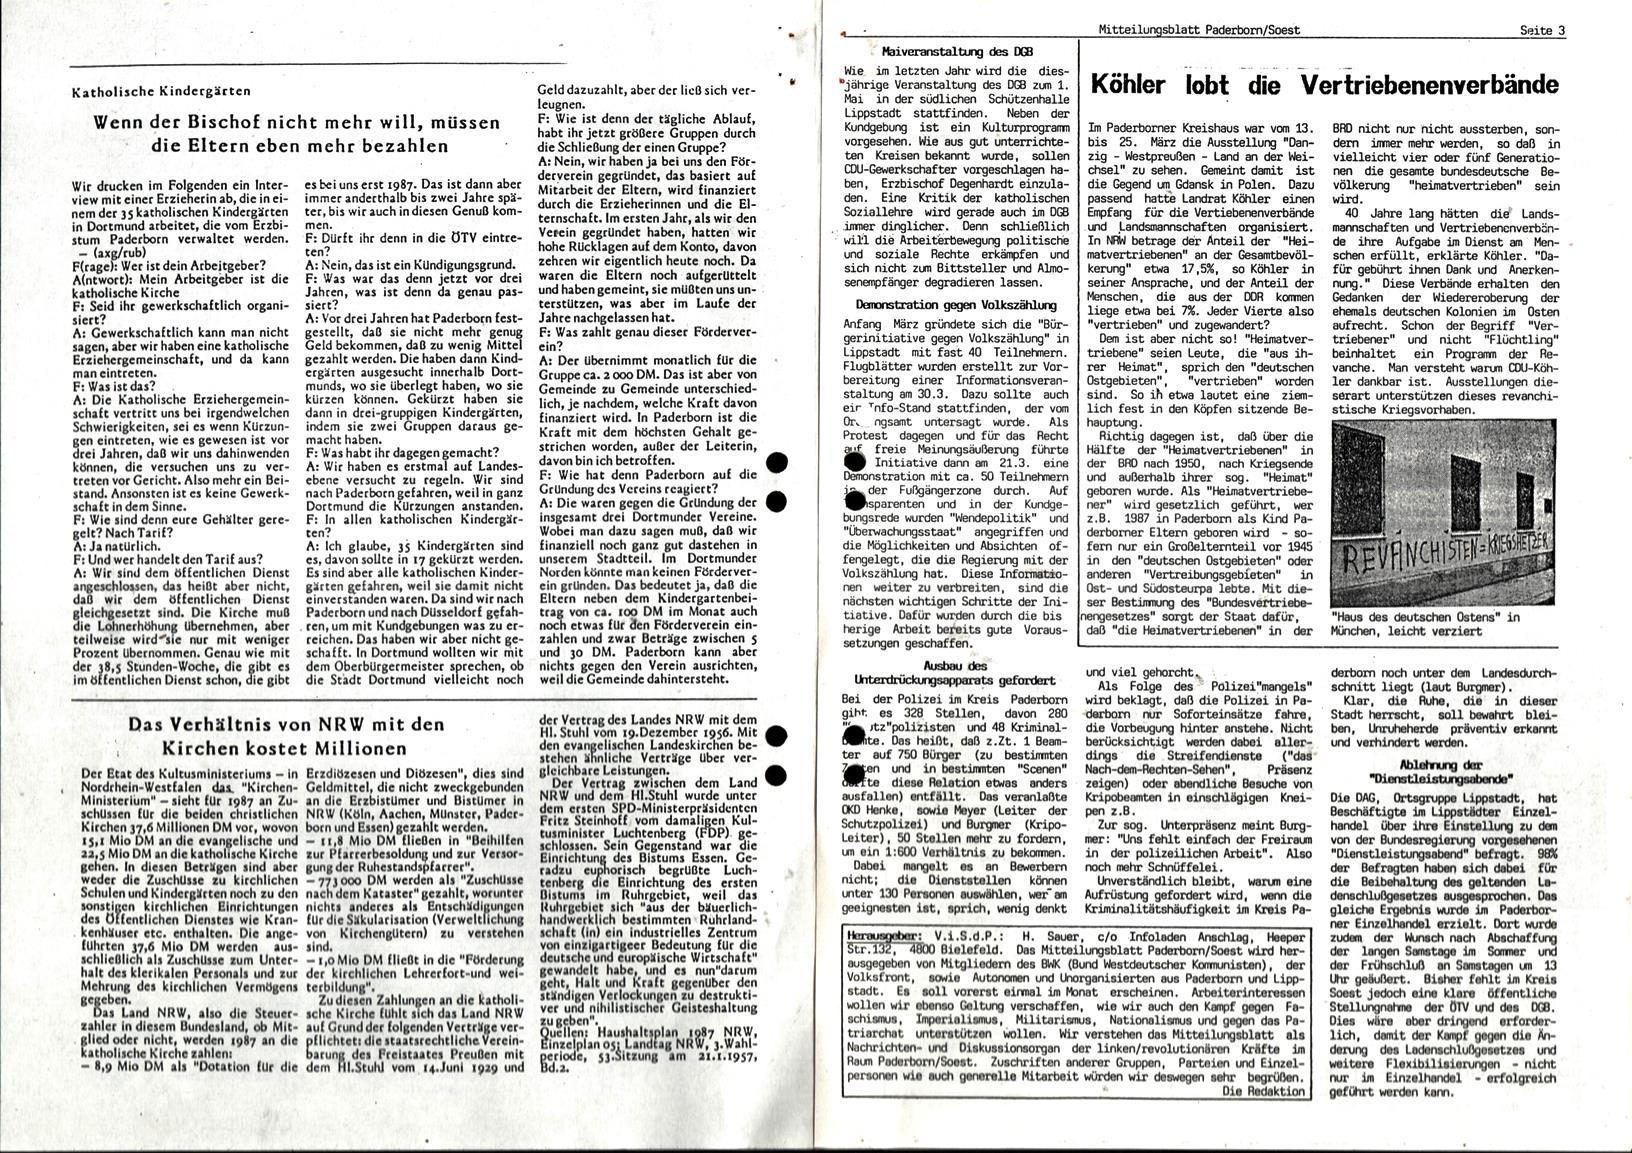 Paderborn_BWK_Mitteilungsblatt_19870406_002